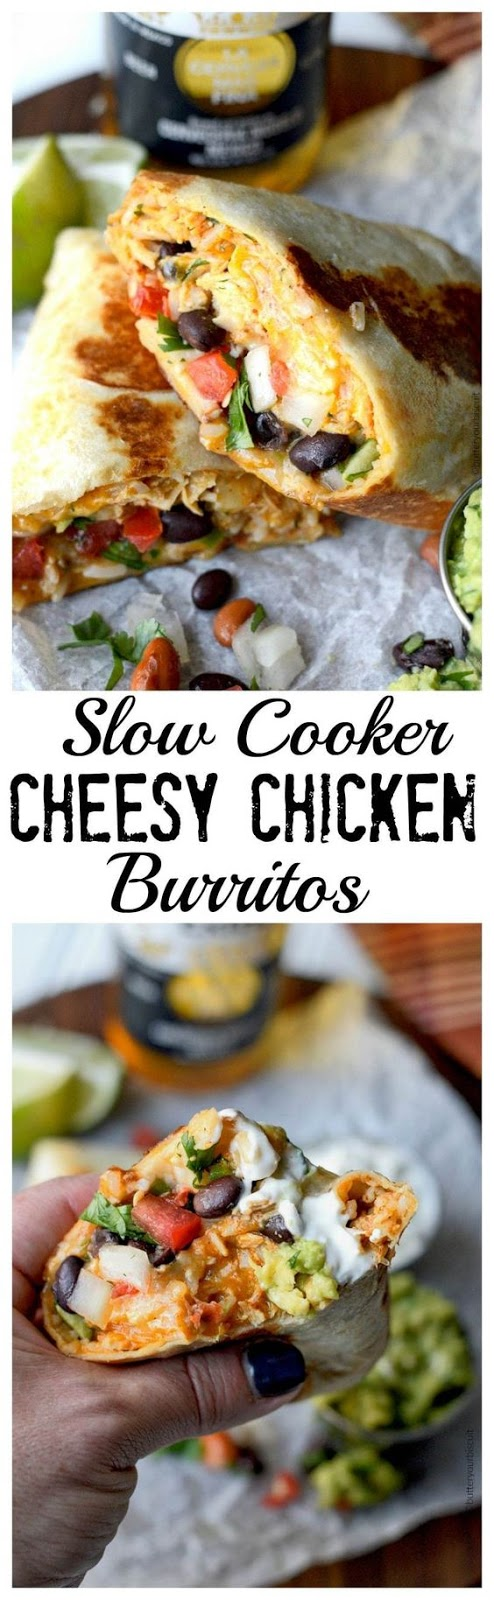 SLOW COOKER CHEESY CHICKEN BURRITOS